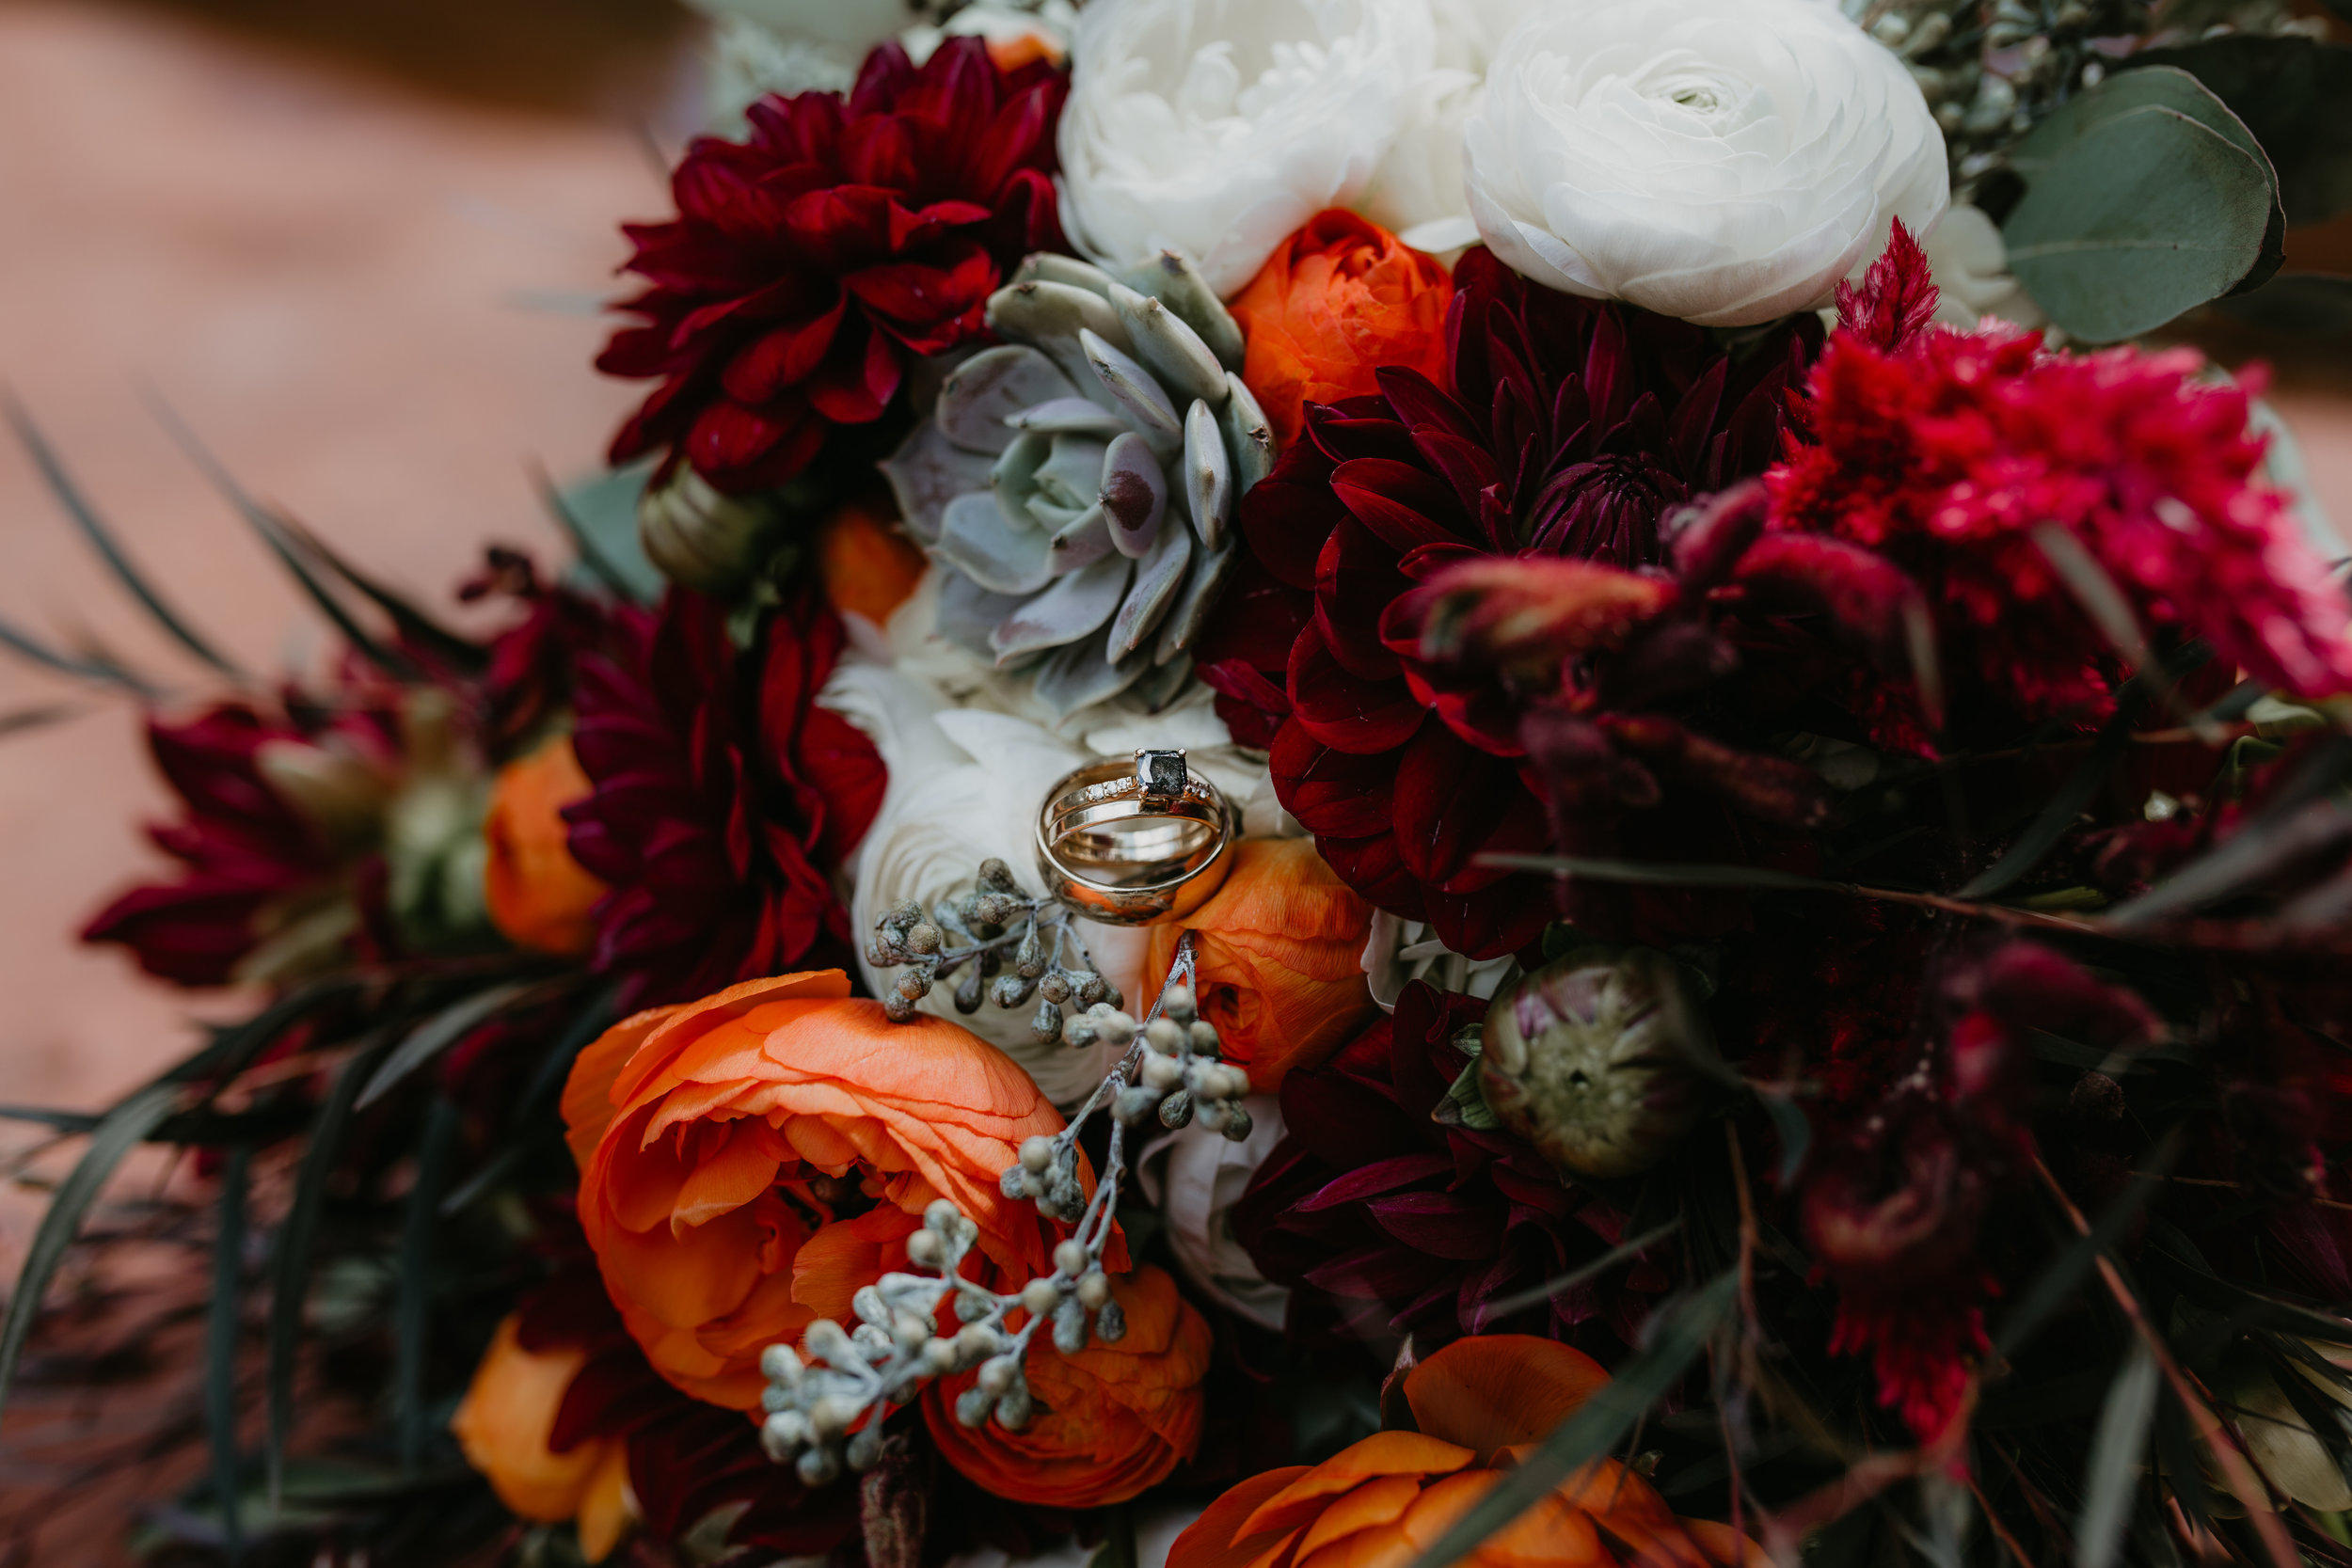 nicole-daacke-photography-sedona-arizona-destination-elopement-wedding-photographer-catherdral-rock-hiking-elopement-sedona-river-elopement-photos-desert-rock-wedding-photographer-laid-back-spontaneous-elopement-101.jpg